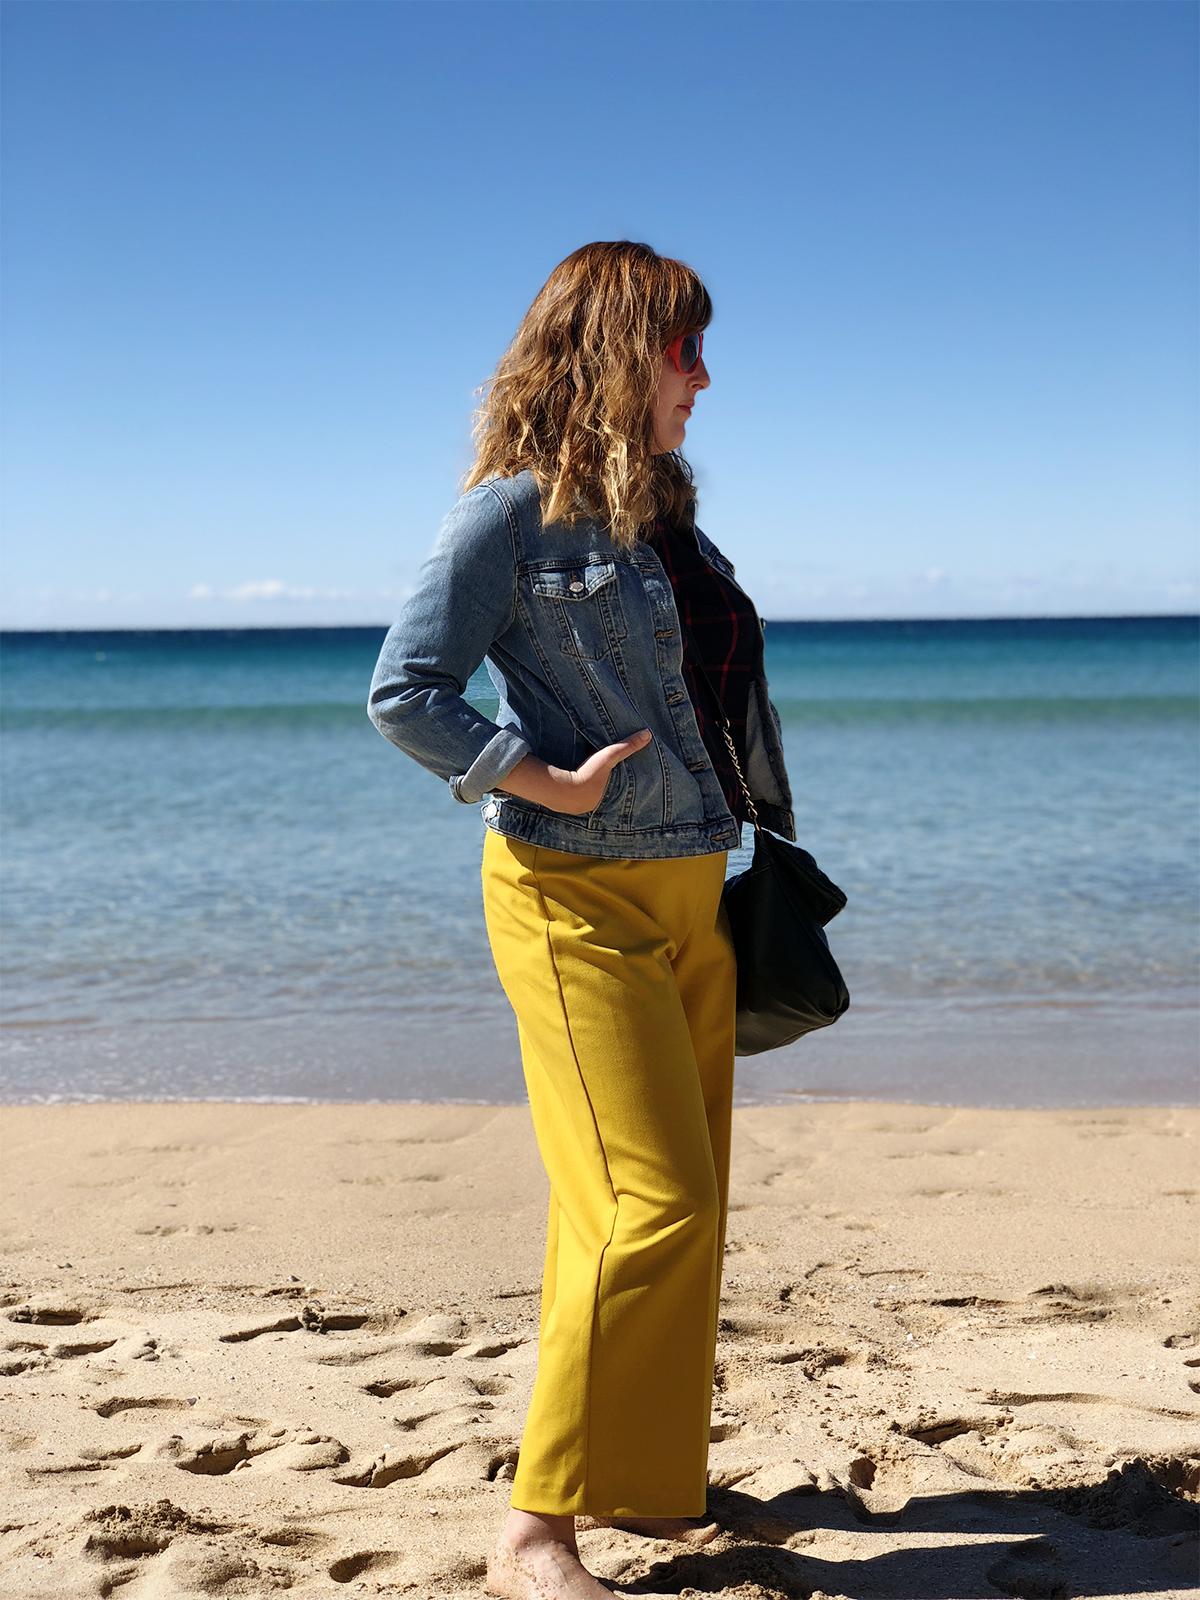 Posing on Manly beach